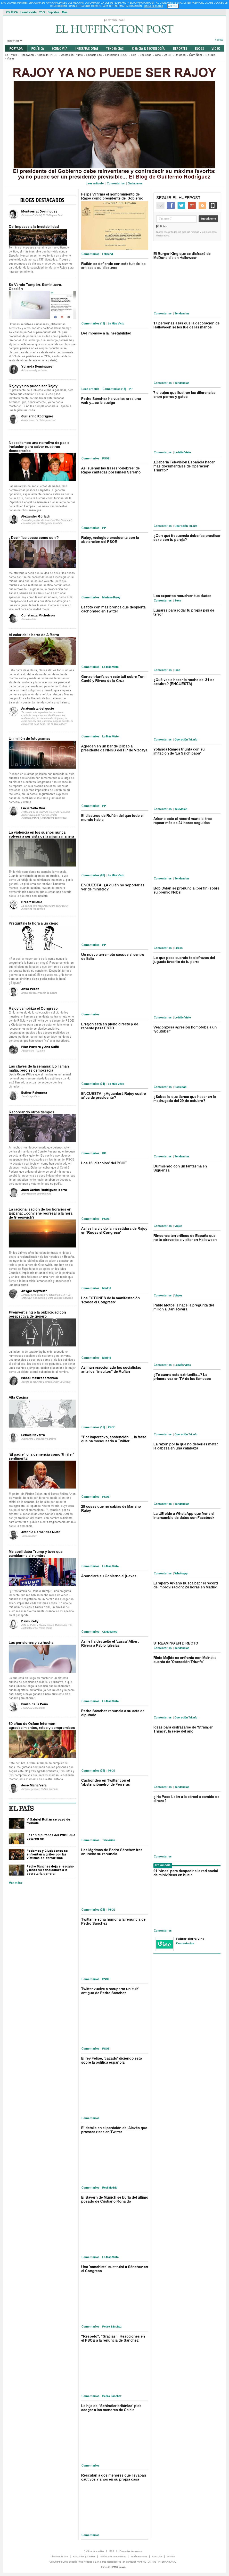 El Huffington Post (Spain) at Sunday Oct. 30, 2016, 3:05 p.m. UTC